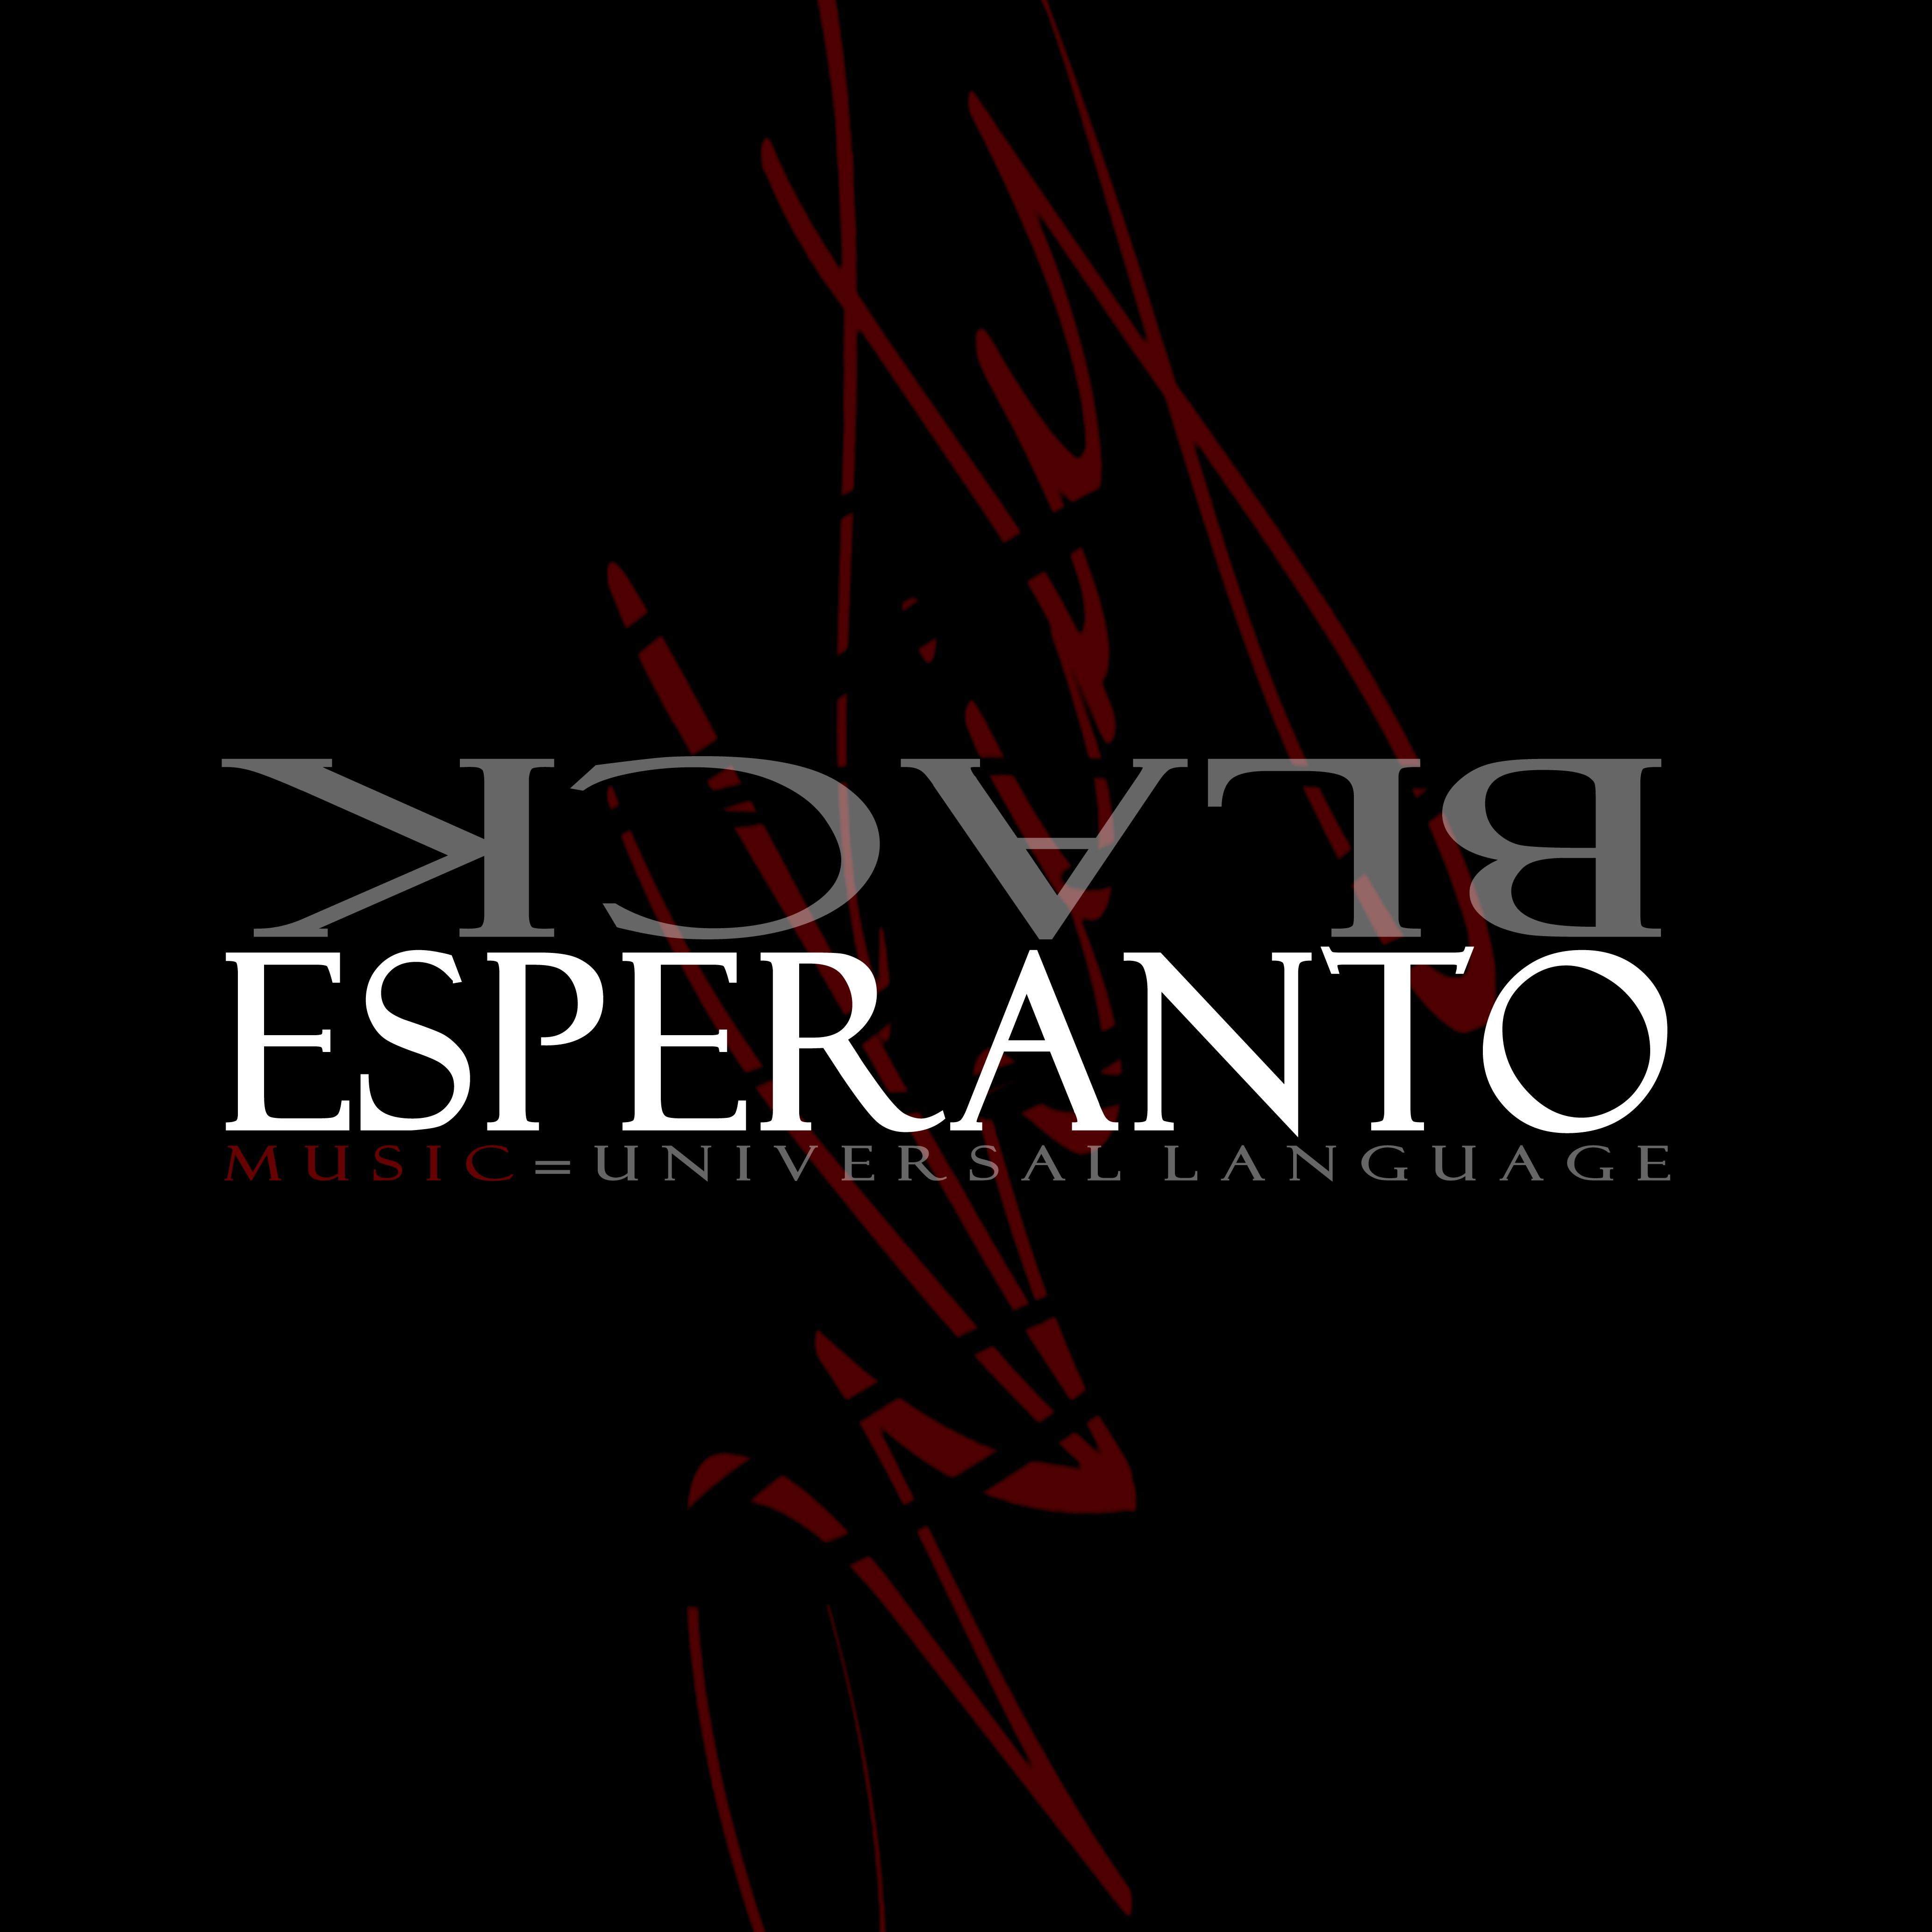 whity-black-esperanto-pochette